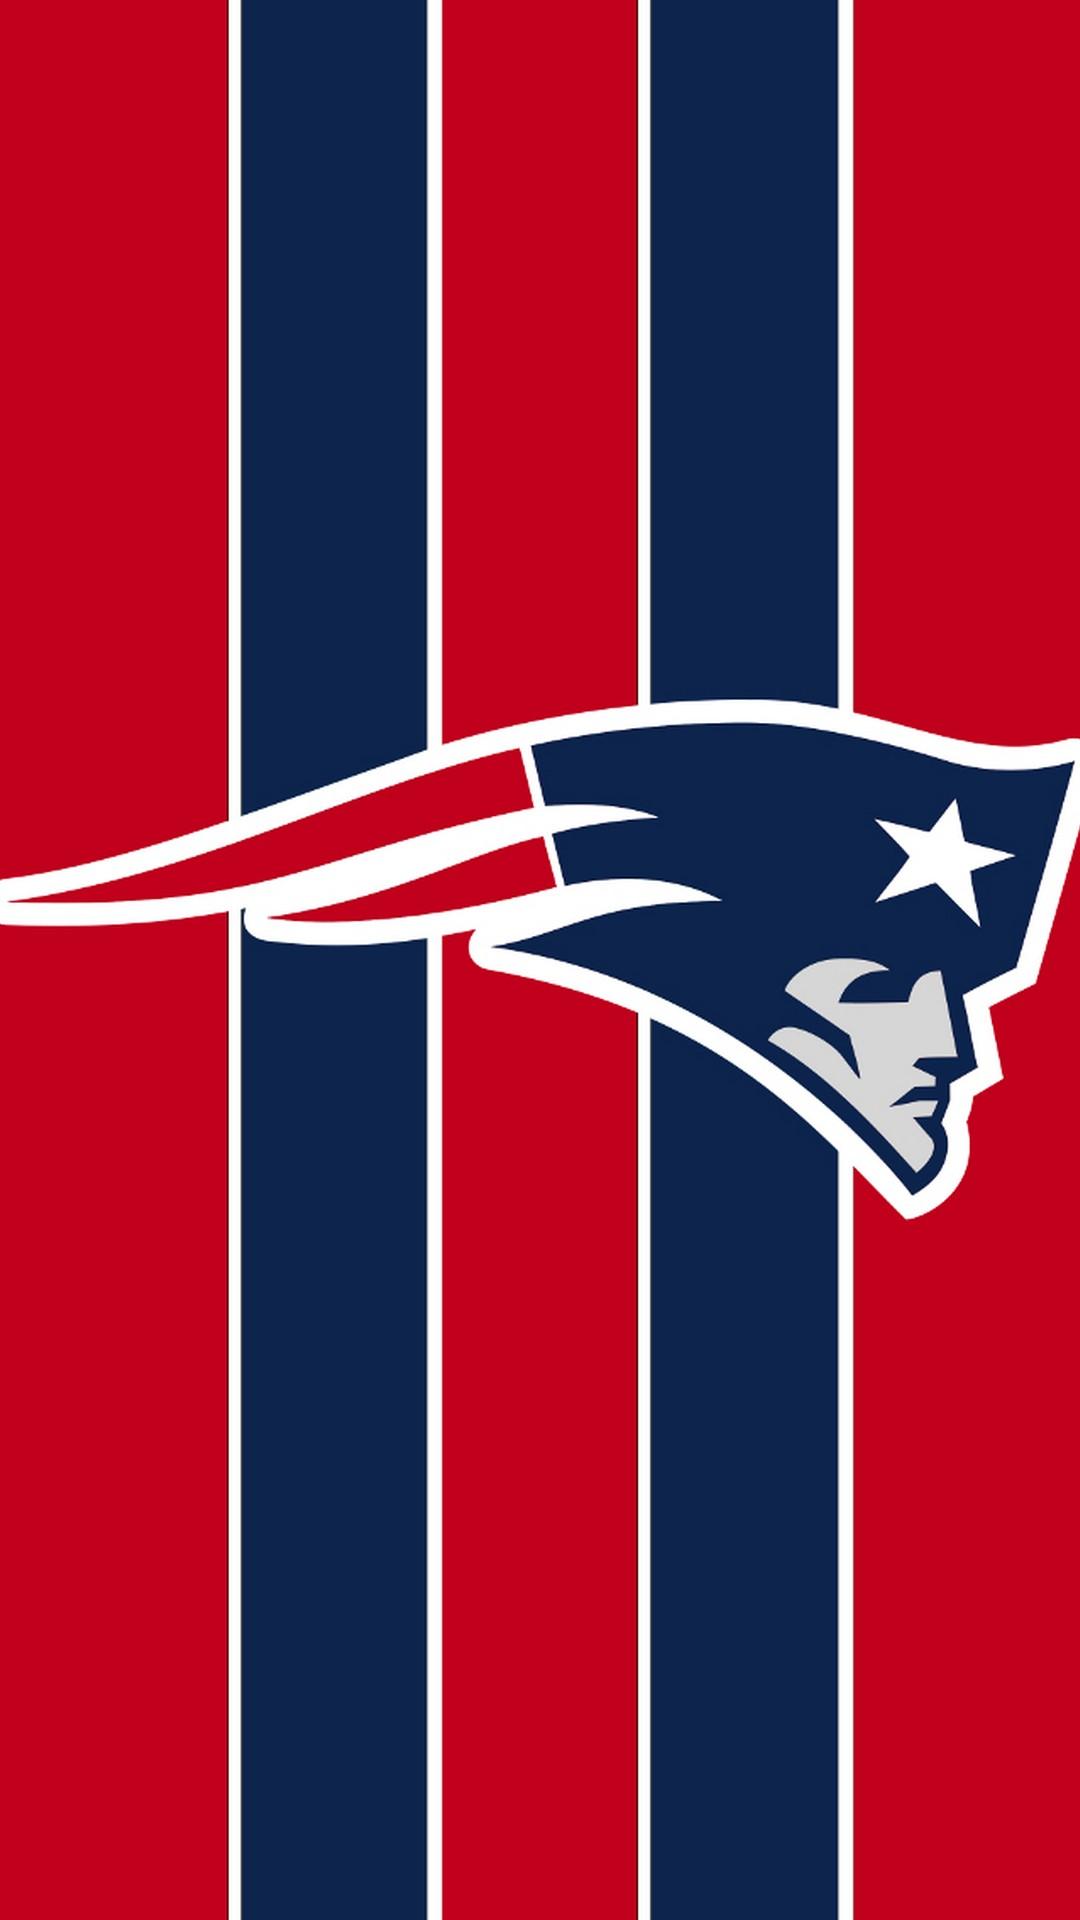 New England Patriots Iphone 6s Plus Wallpaper With - High Resolution New England Patriots - HD Wallpaper